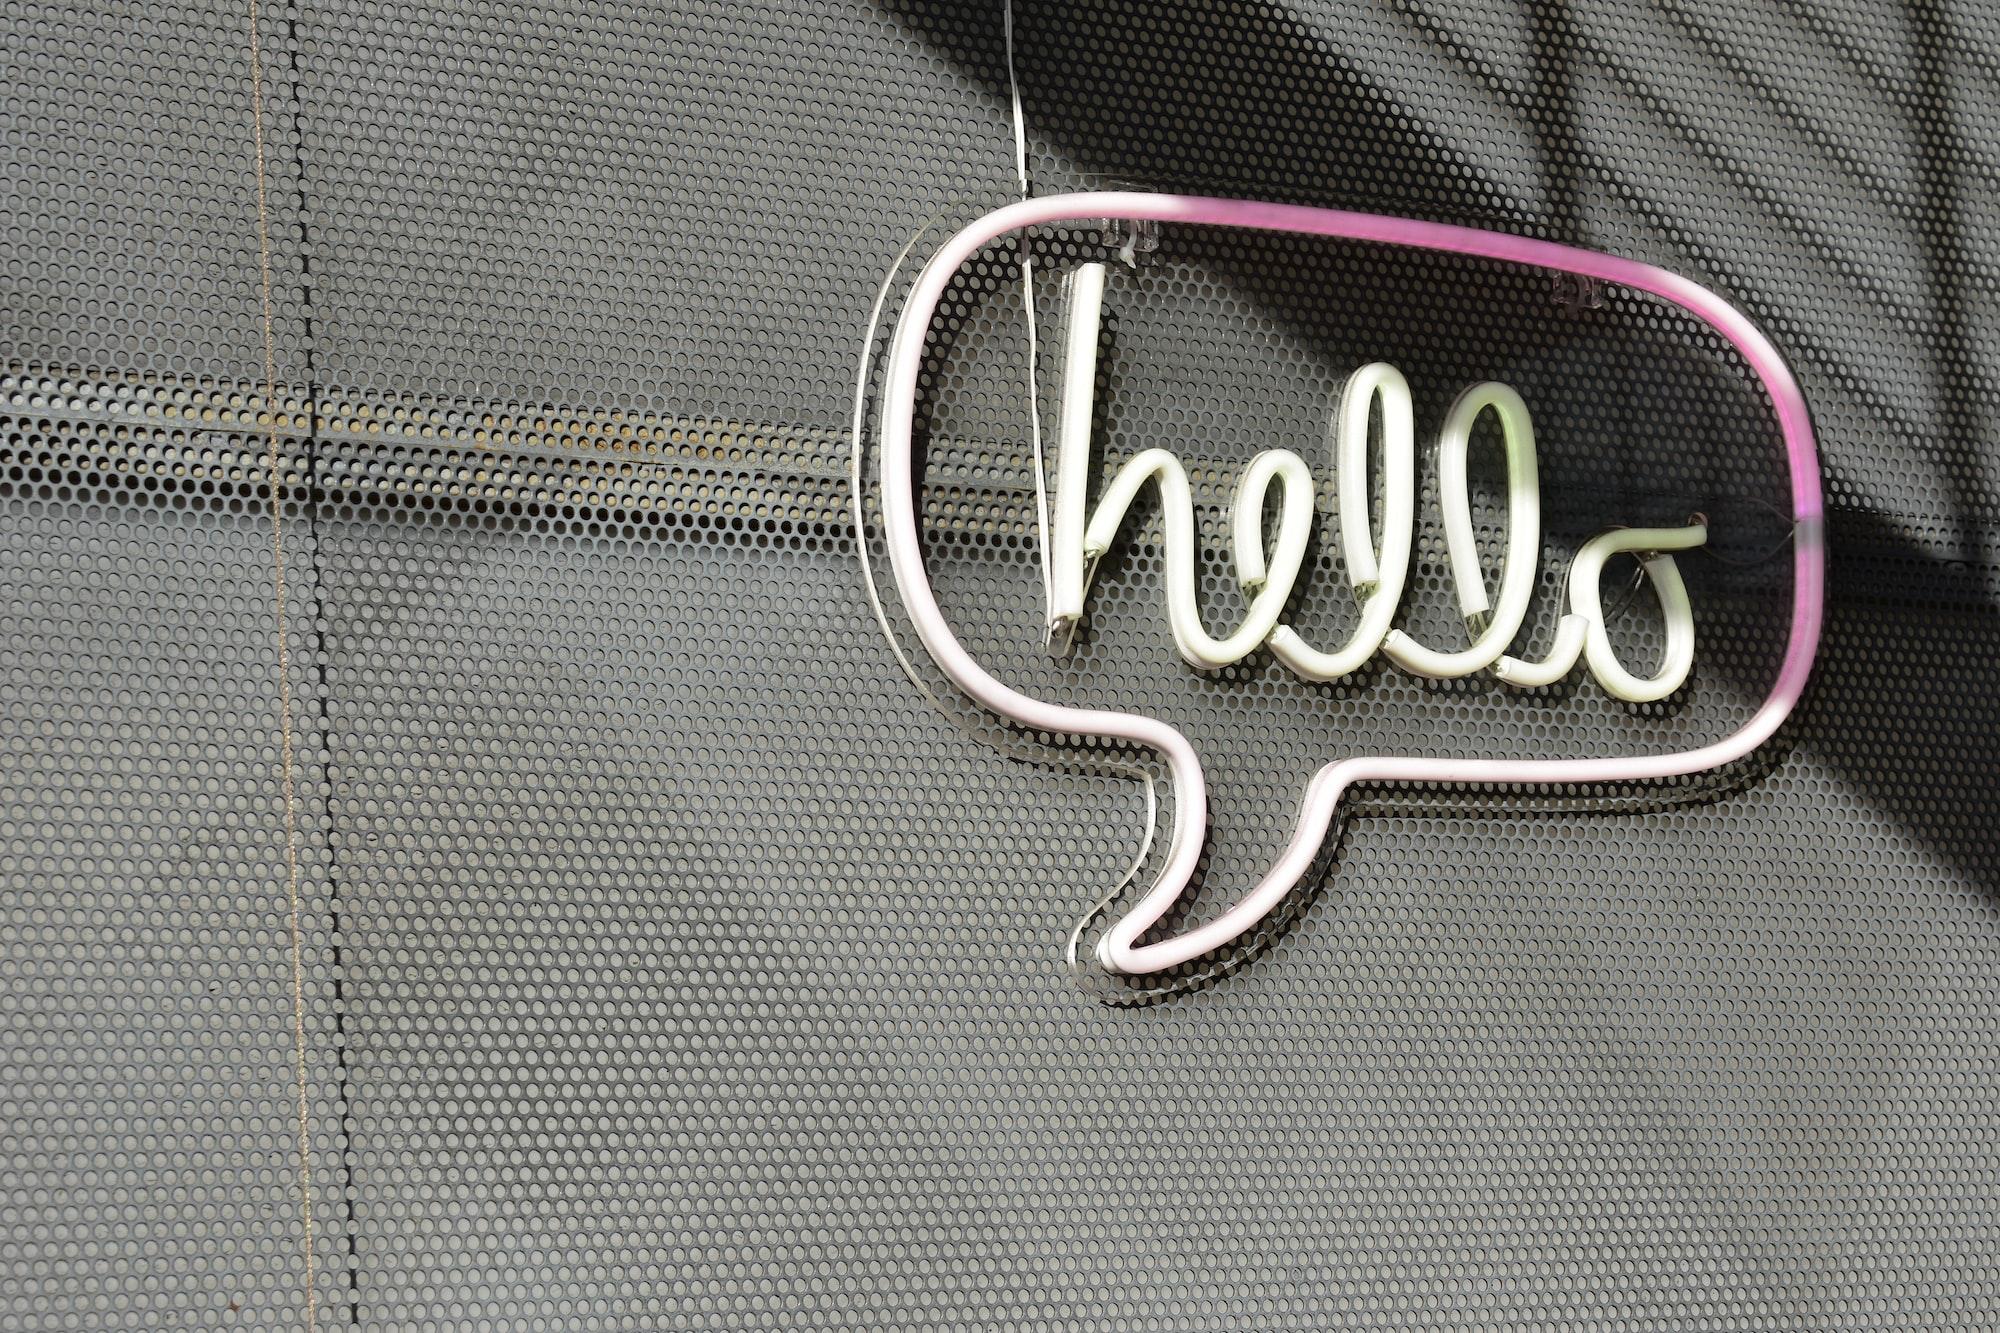 Contact - say hello